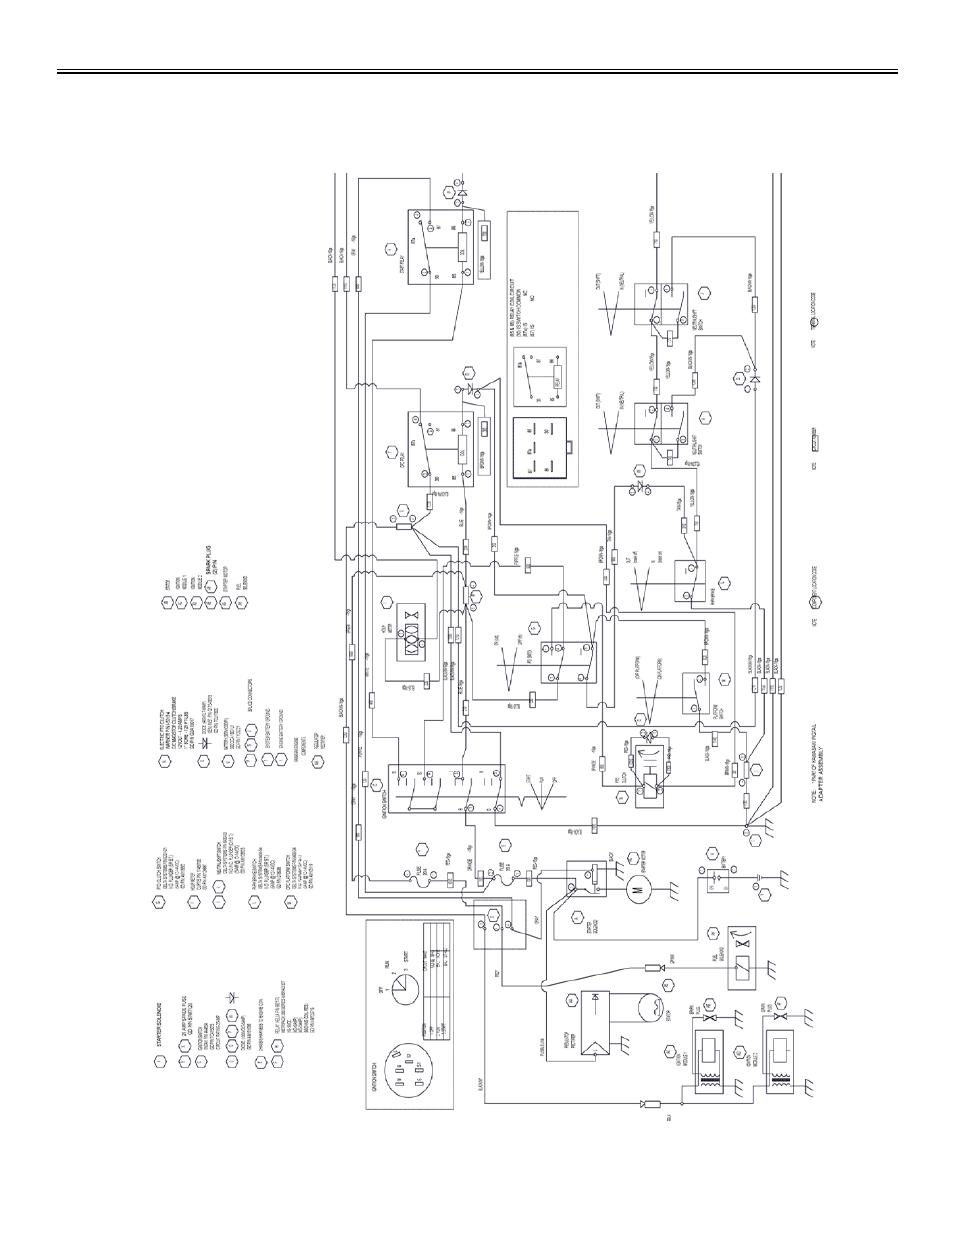 Great Dane Wiring Schematic | Wiring Diagram on tractor trailer diagram, western star wiring diagram, thomas school bus wiring diagram, ihc wiring diagram, caterpillar wiring diagram, great dane trailer plug, spartan motors wiring diagram, autocar wiring diagram, am general wiring diagram, case wiring diagram, hino wiring diagram, featherlite wiring diagram, gm wiring diagram, gulfstream wiring diagram, workhorse wiring diagram, great dane trailer brake system, bombardier wiring diagram, crane carrier wiring diagram, kawasaki wiring diagram, semi tractor air system diagram,